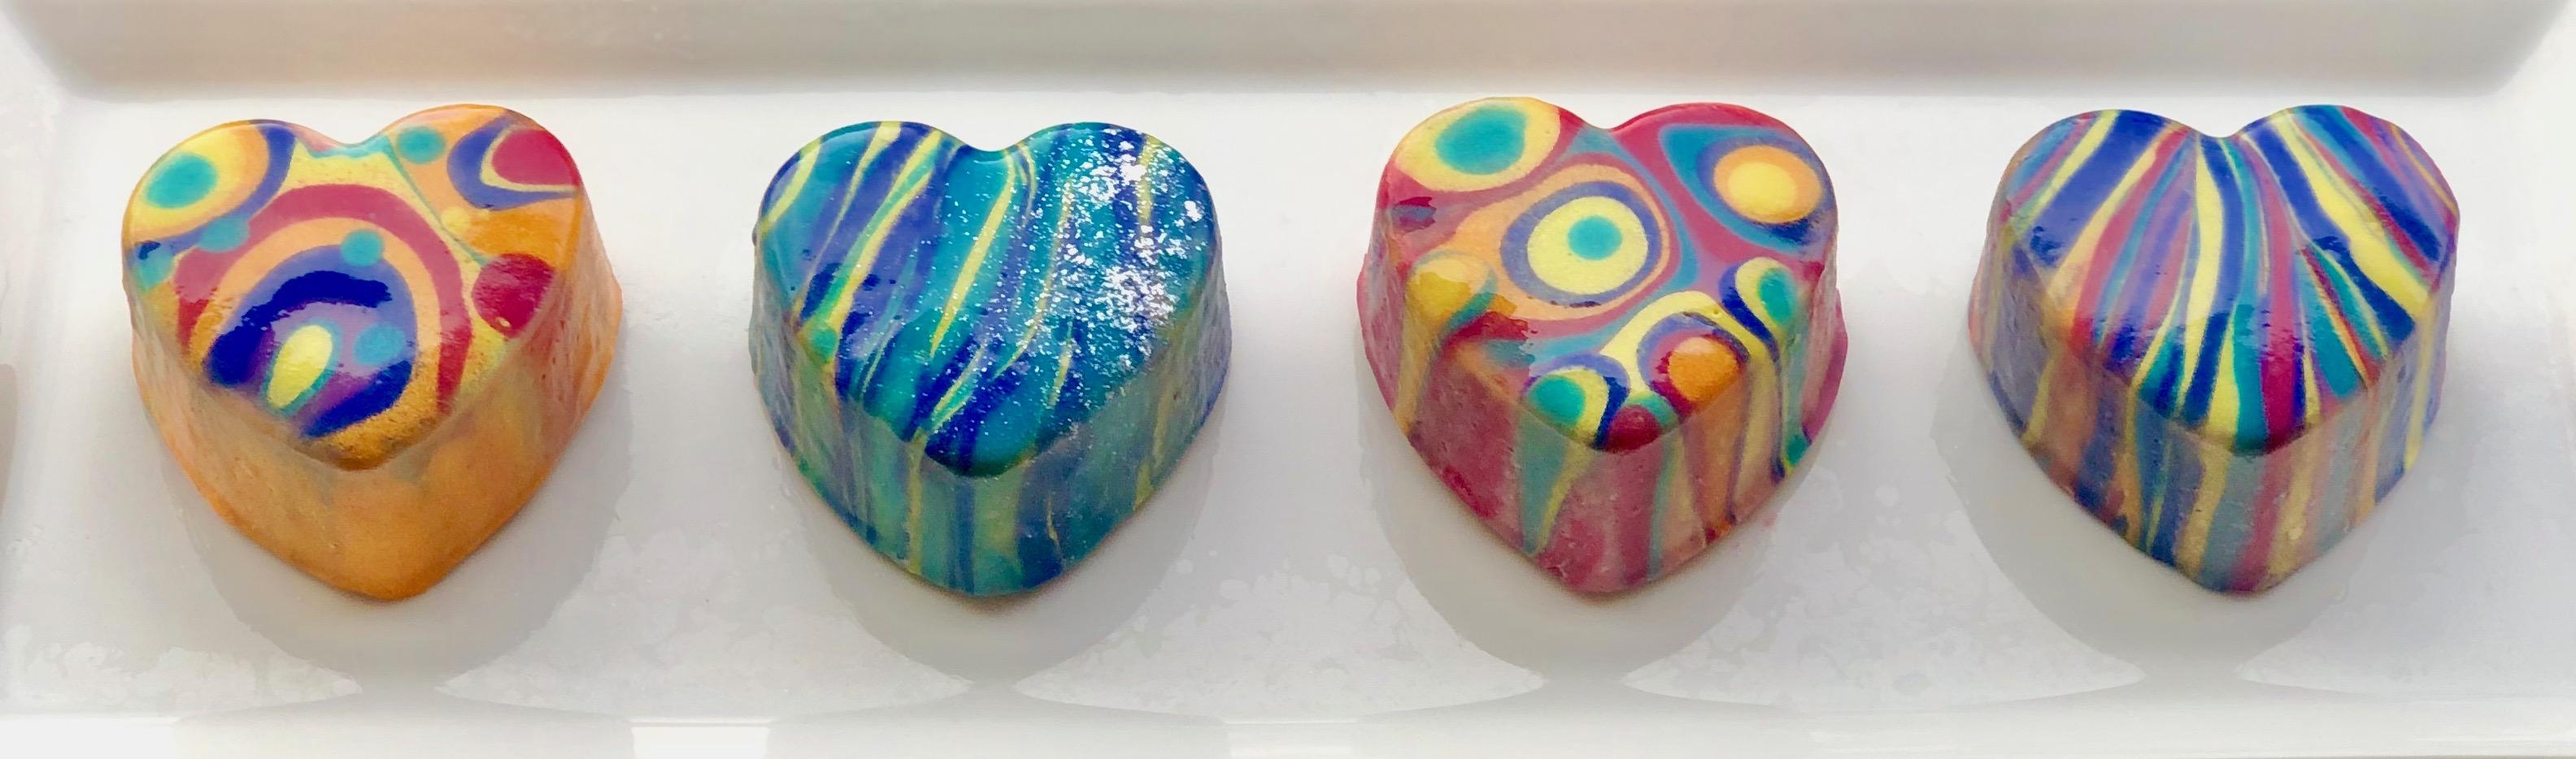 vibrant heart soap